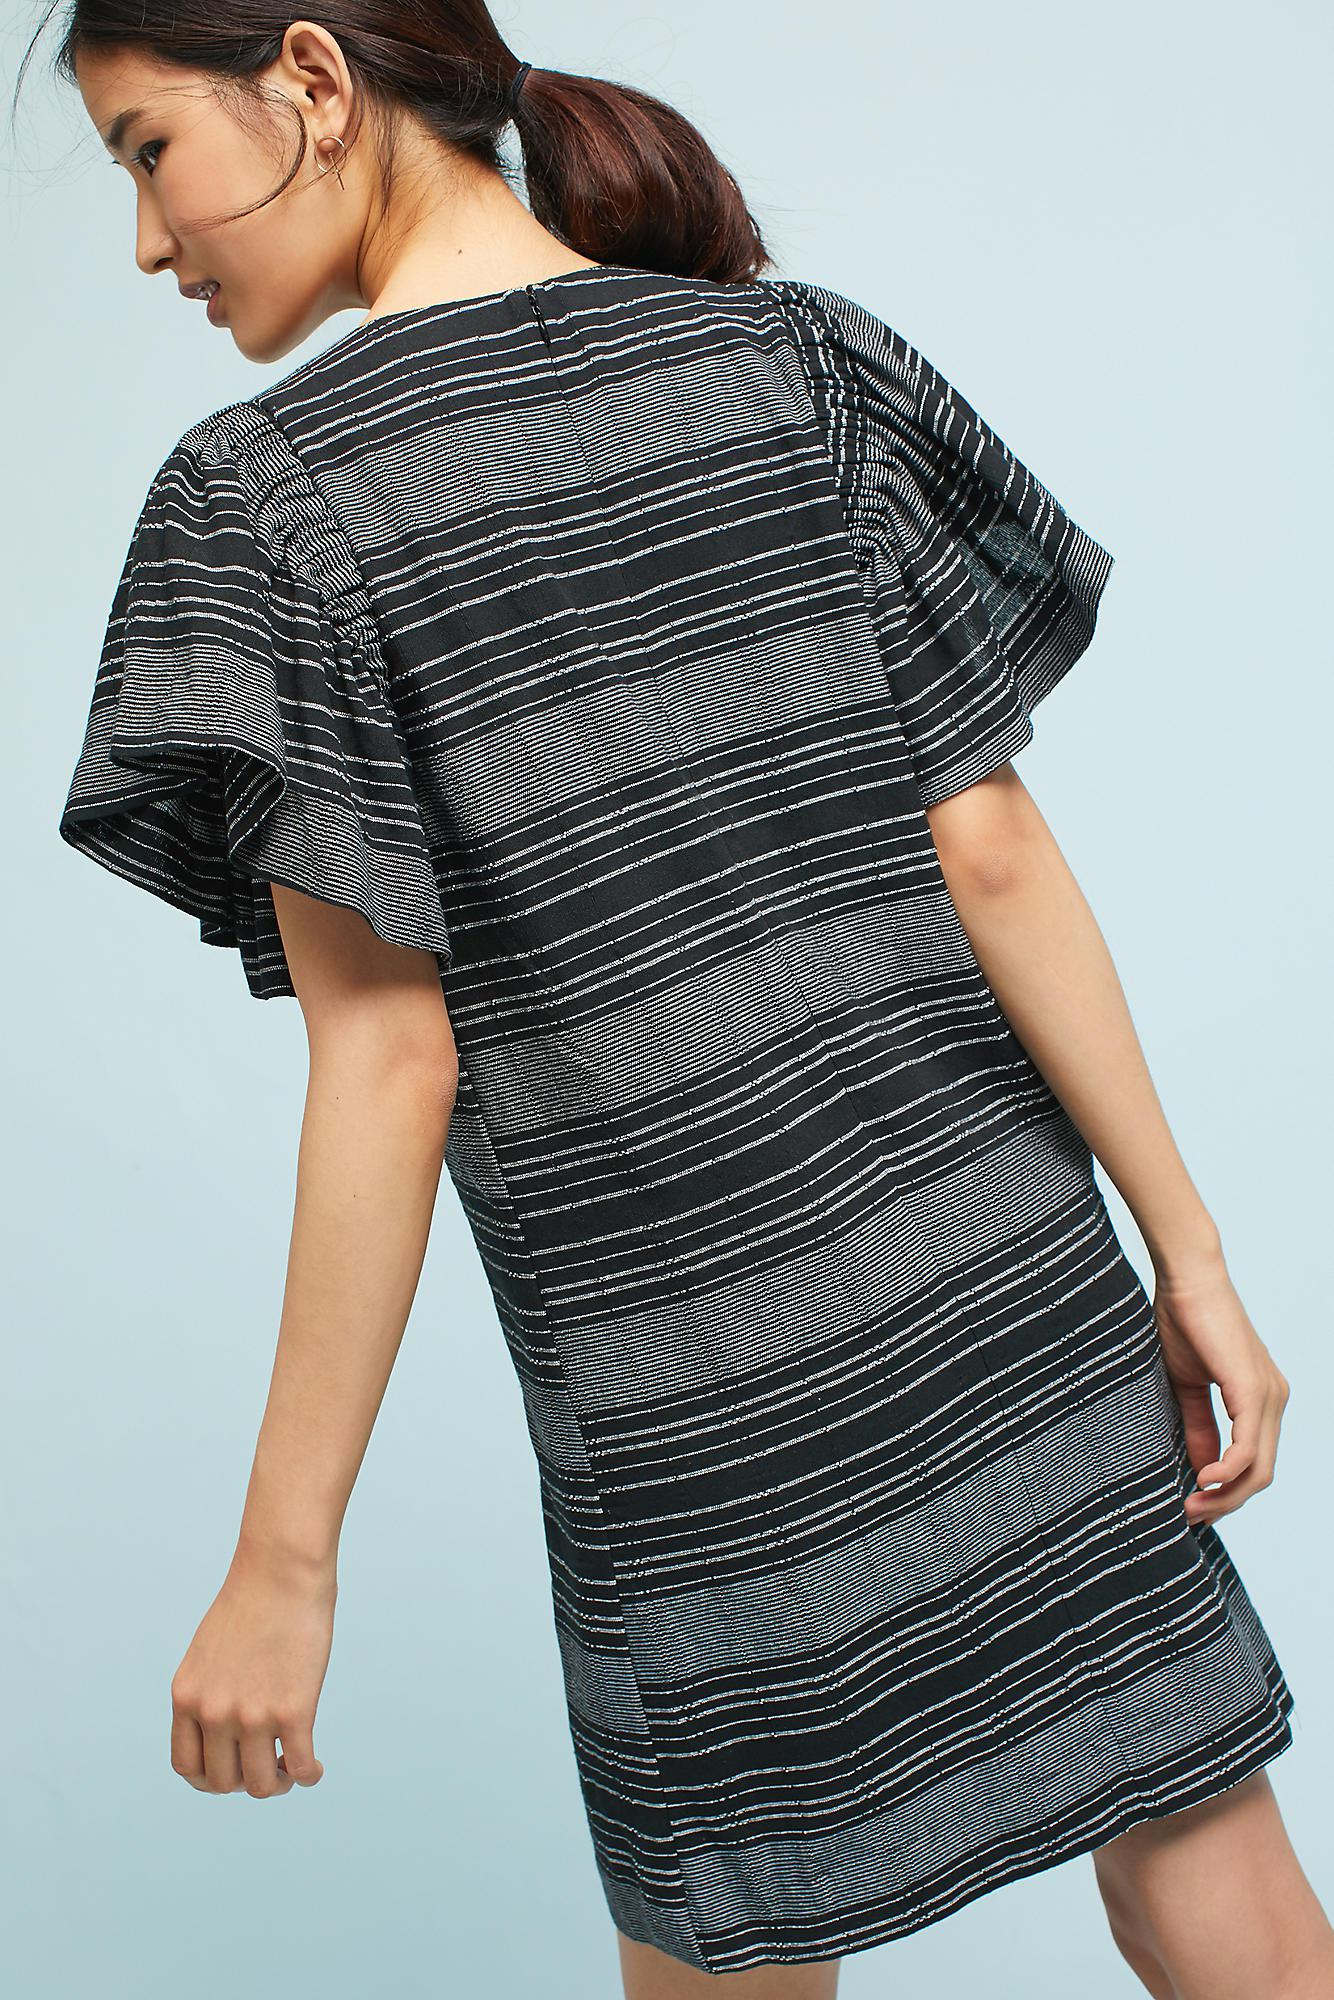 Anthropologie Cotton Denmark Striped Tunic Dress Black Lyst